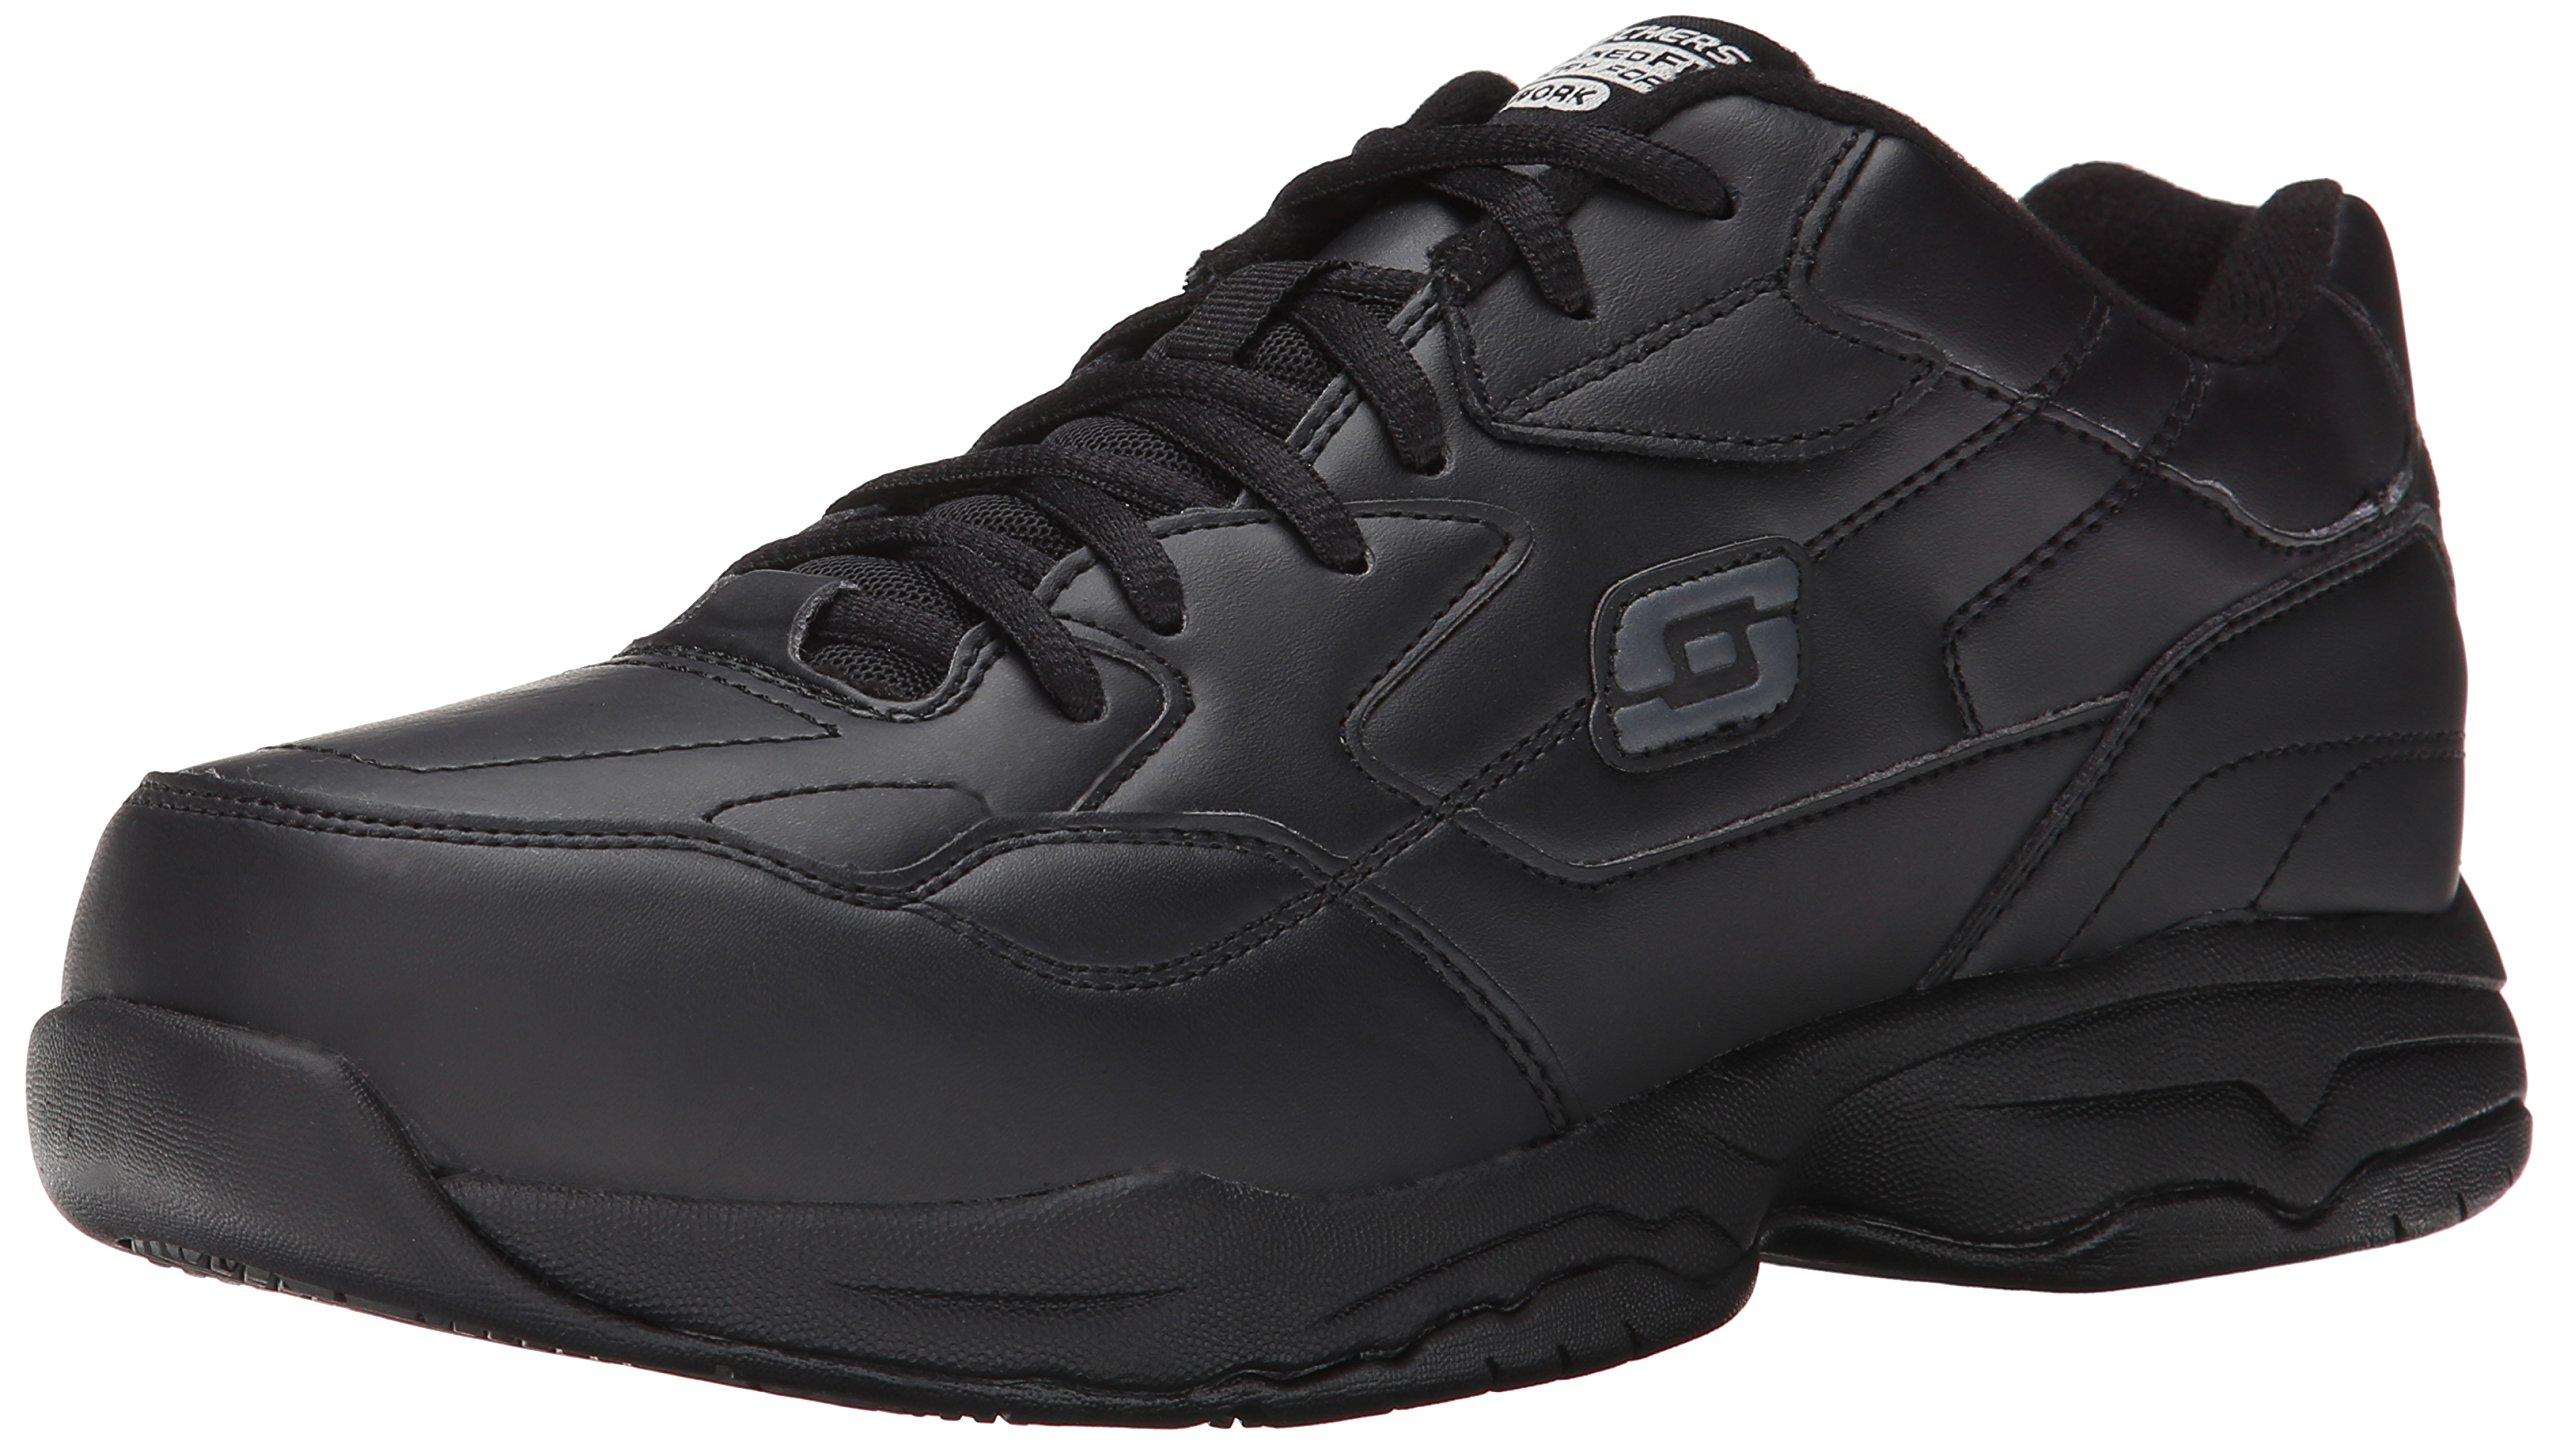 Skechers for Work Men's Felton Shoe, Black, 13 XW US